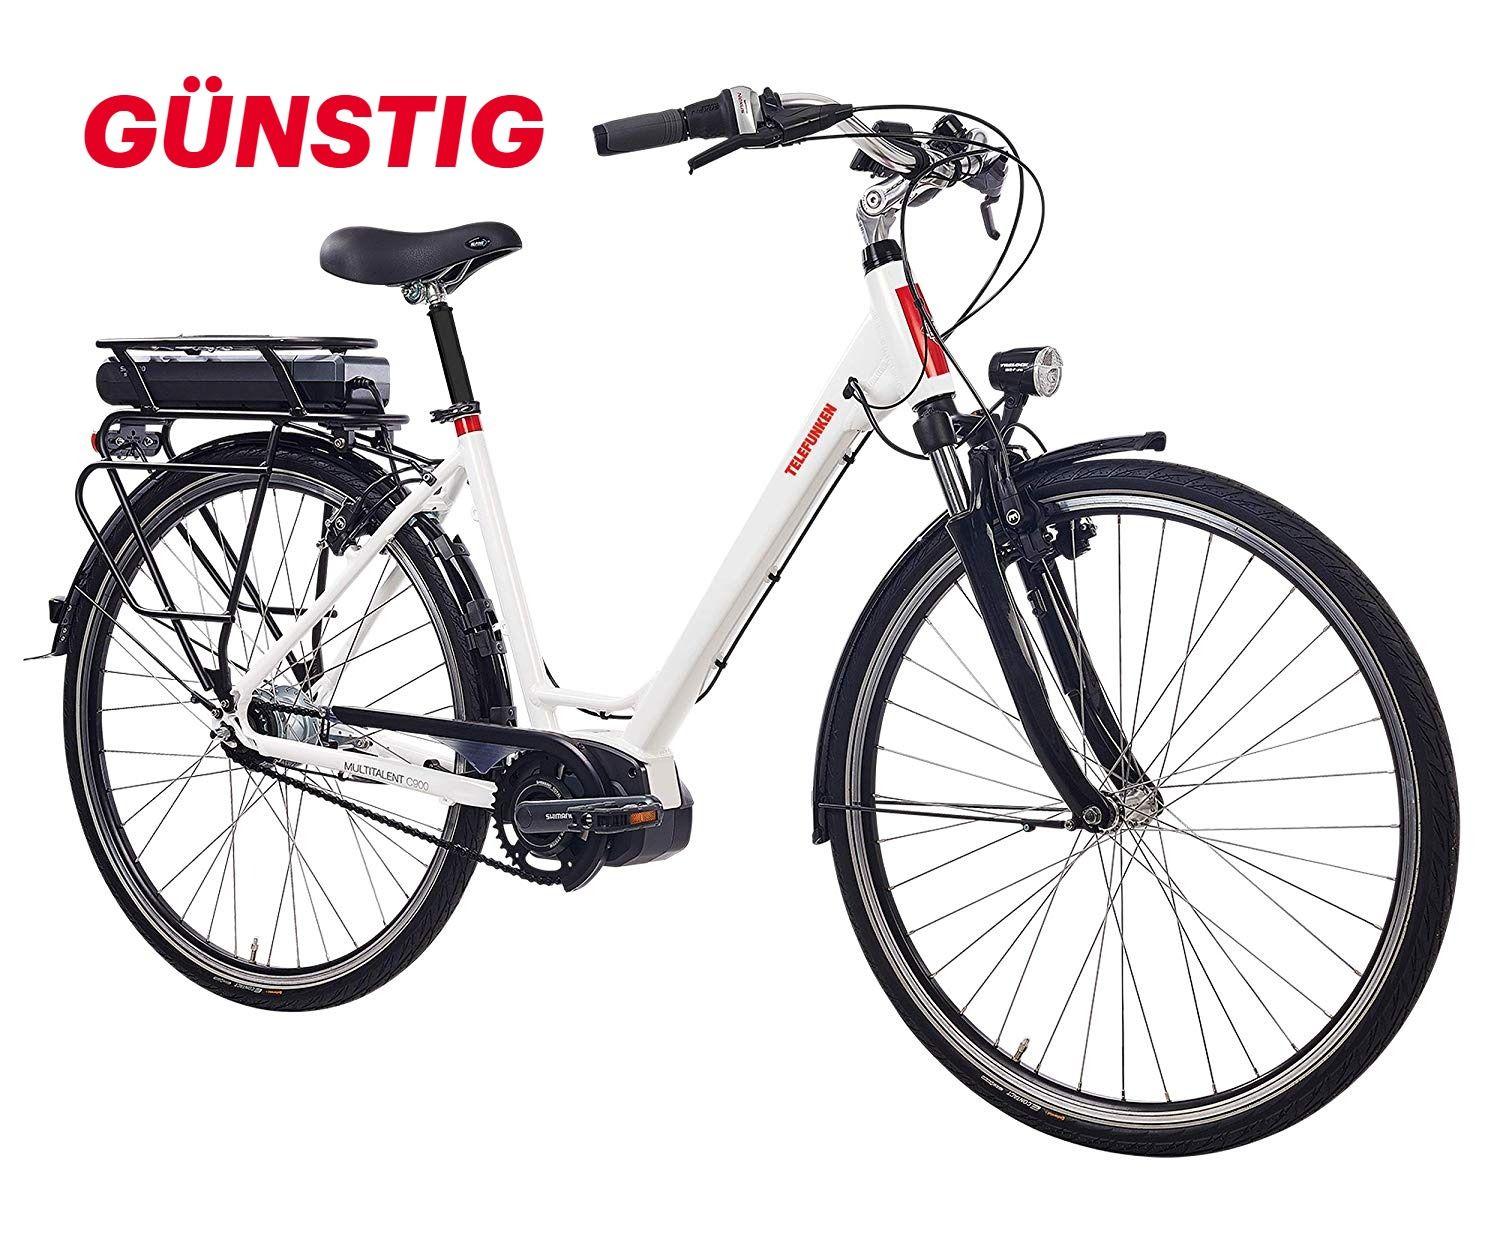 Telefunken E Bike Elektrofahrrad Alu Weiss 8 Gang Shimano Nabenschaltung Pedelec Citybike Leicht Shimano Steps Mittelmotor 25 In 2020 Elektrofahrrad Pedelec E Bike